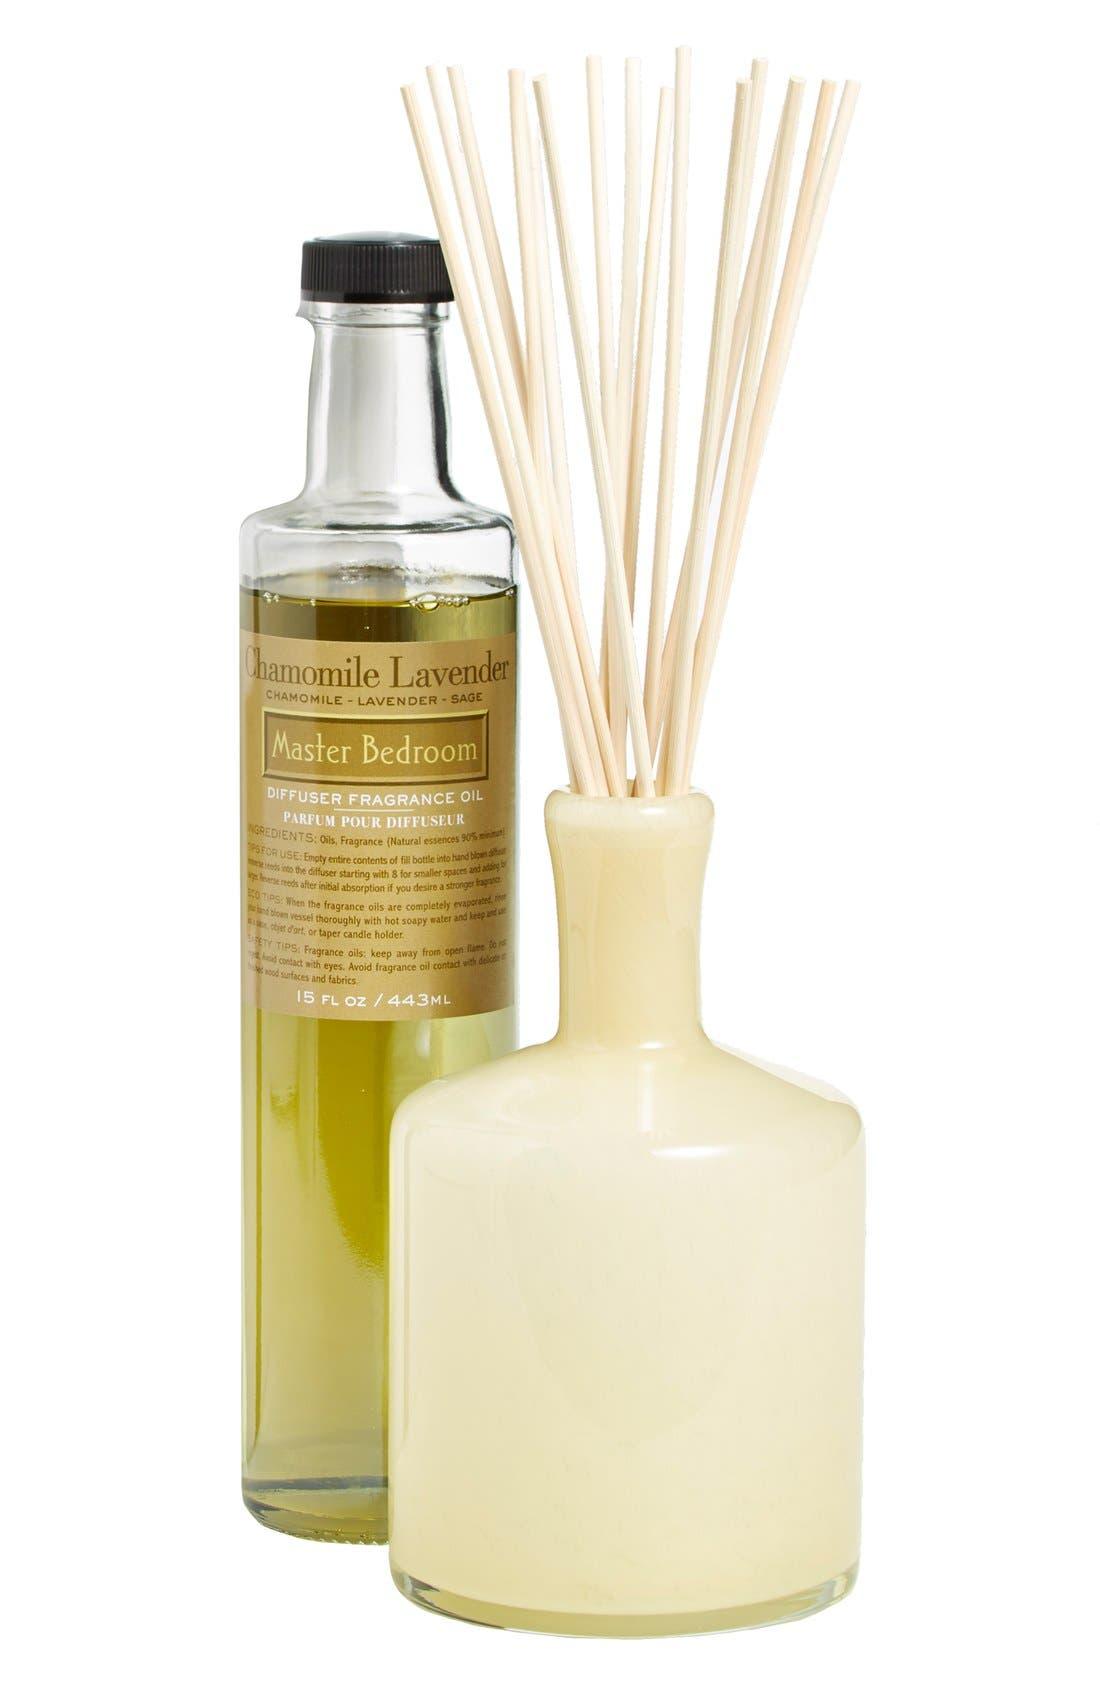 Lafco 'Chamomile Lavender - Master Bedroom' Fragrance Diffuser